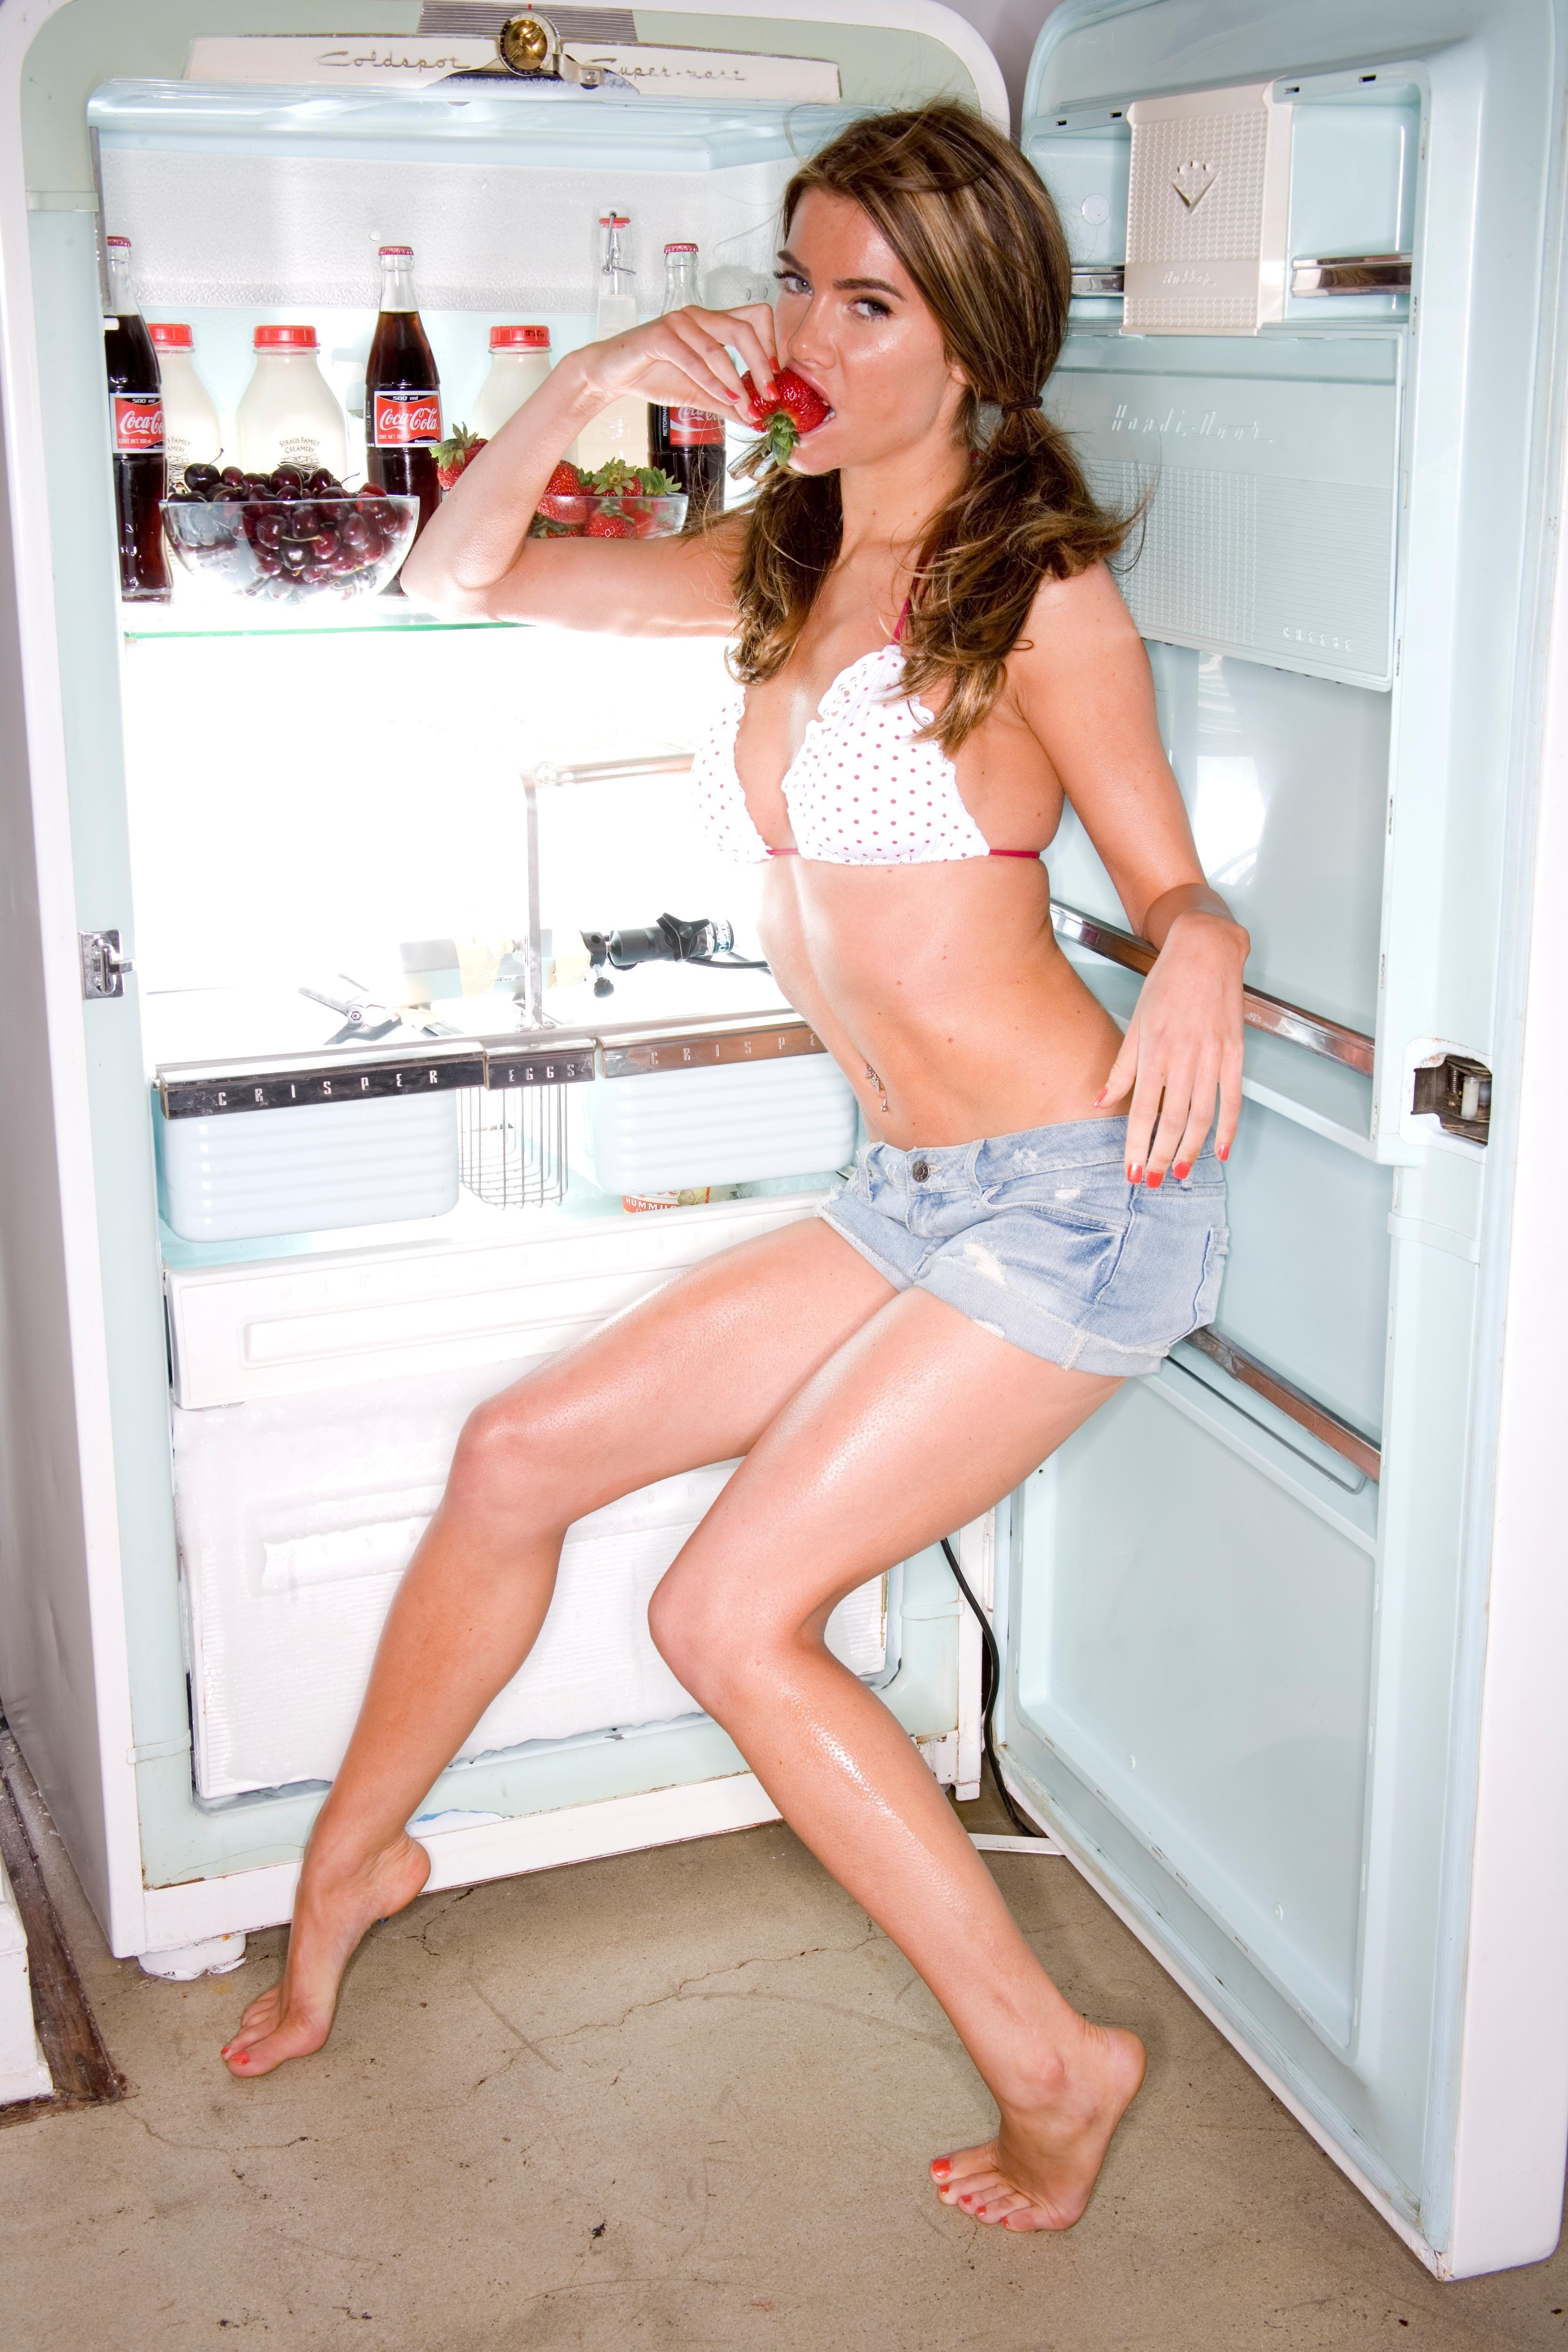 Jacqueline macinnes wood nuda hot pic 867